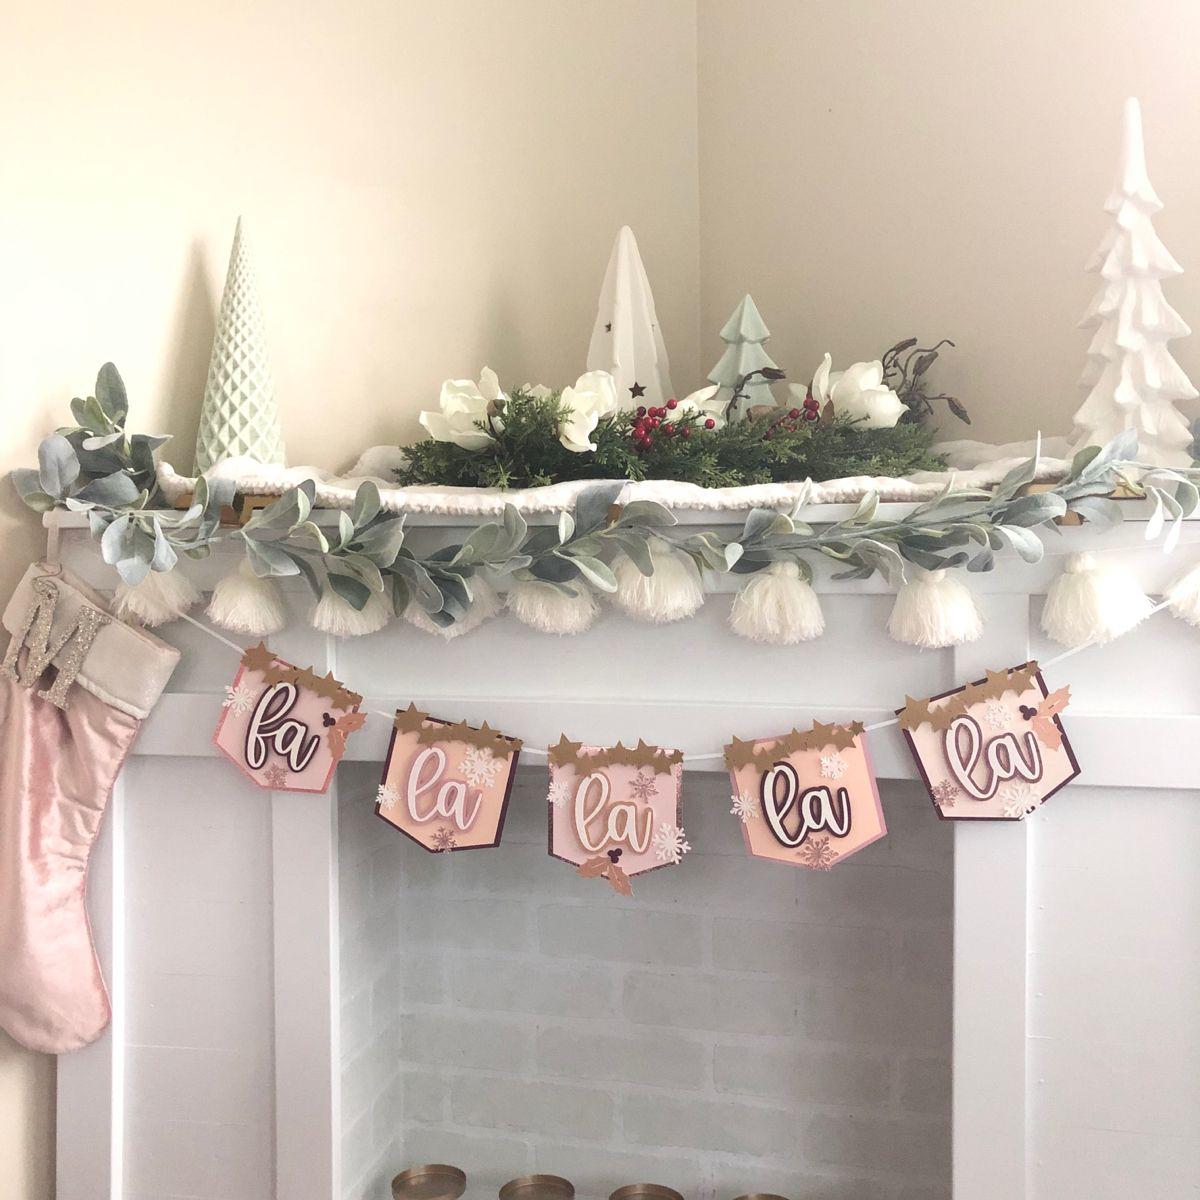 Fa La La La La Pink Christmas Holiday Banner In Muted Colors Etsy In 2020 Pink Christmas Christmas Party Decorations Pink